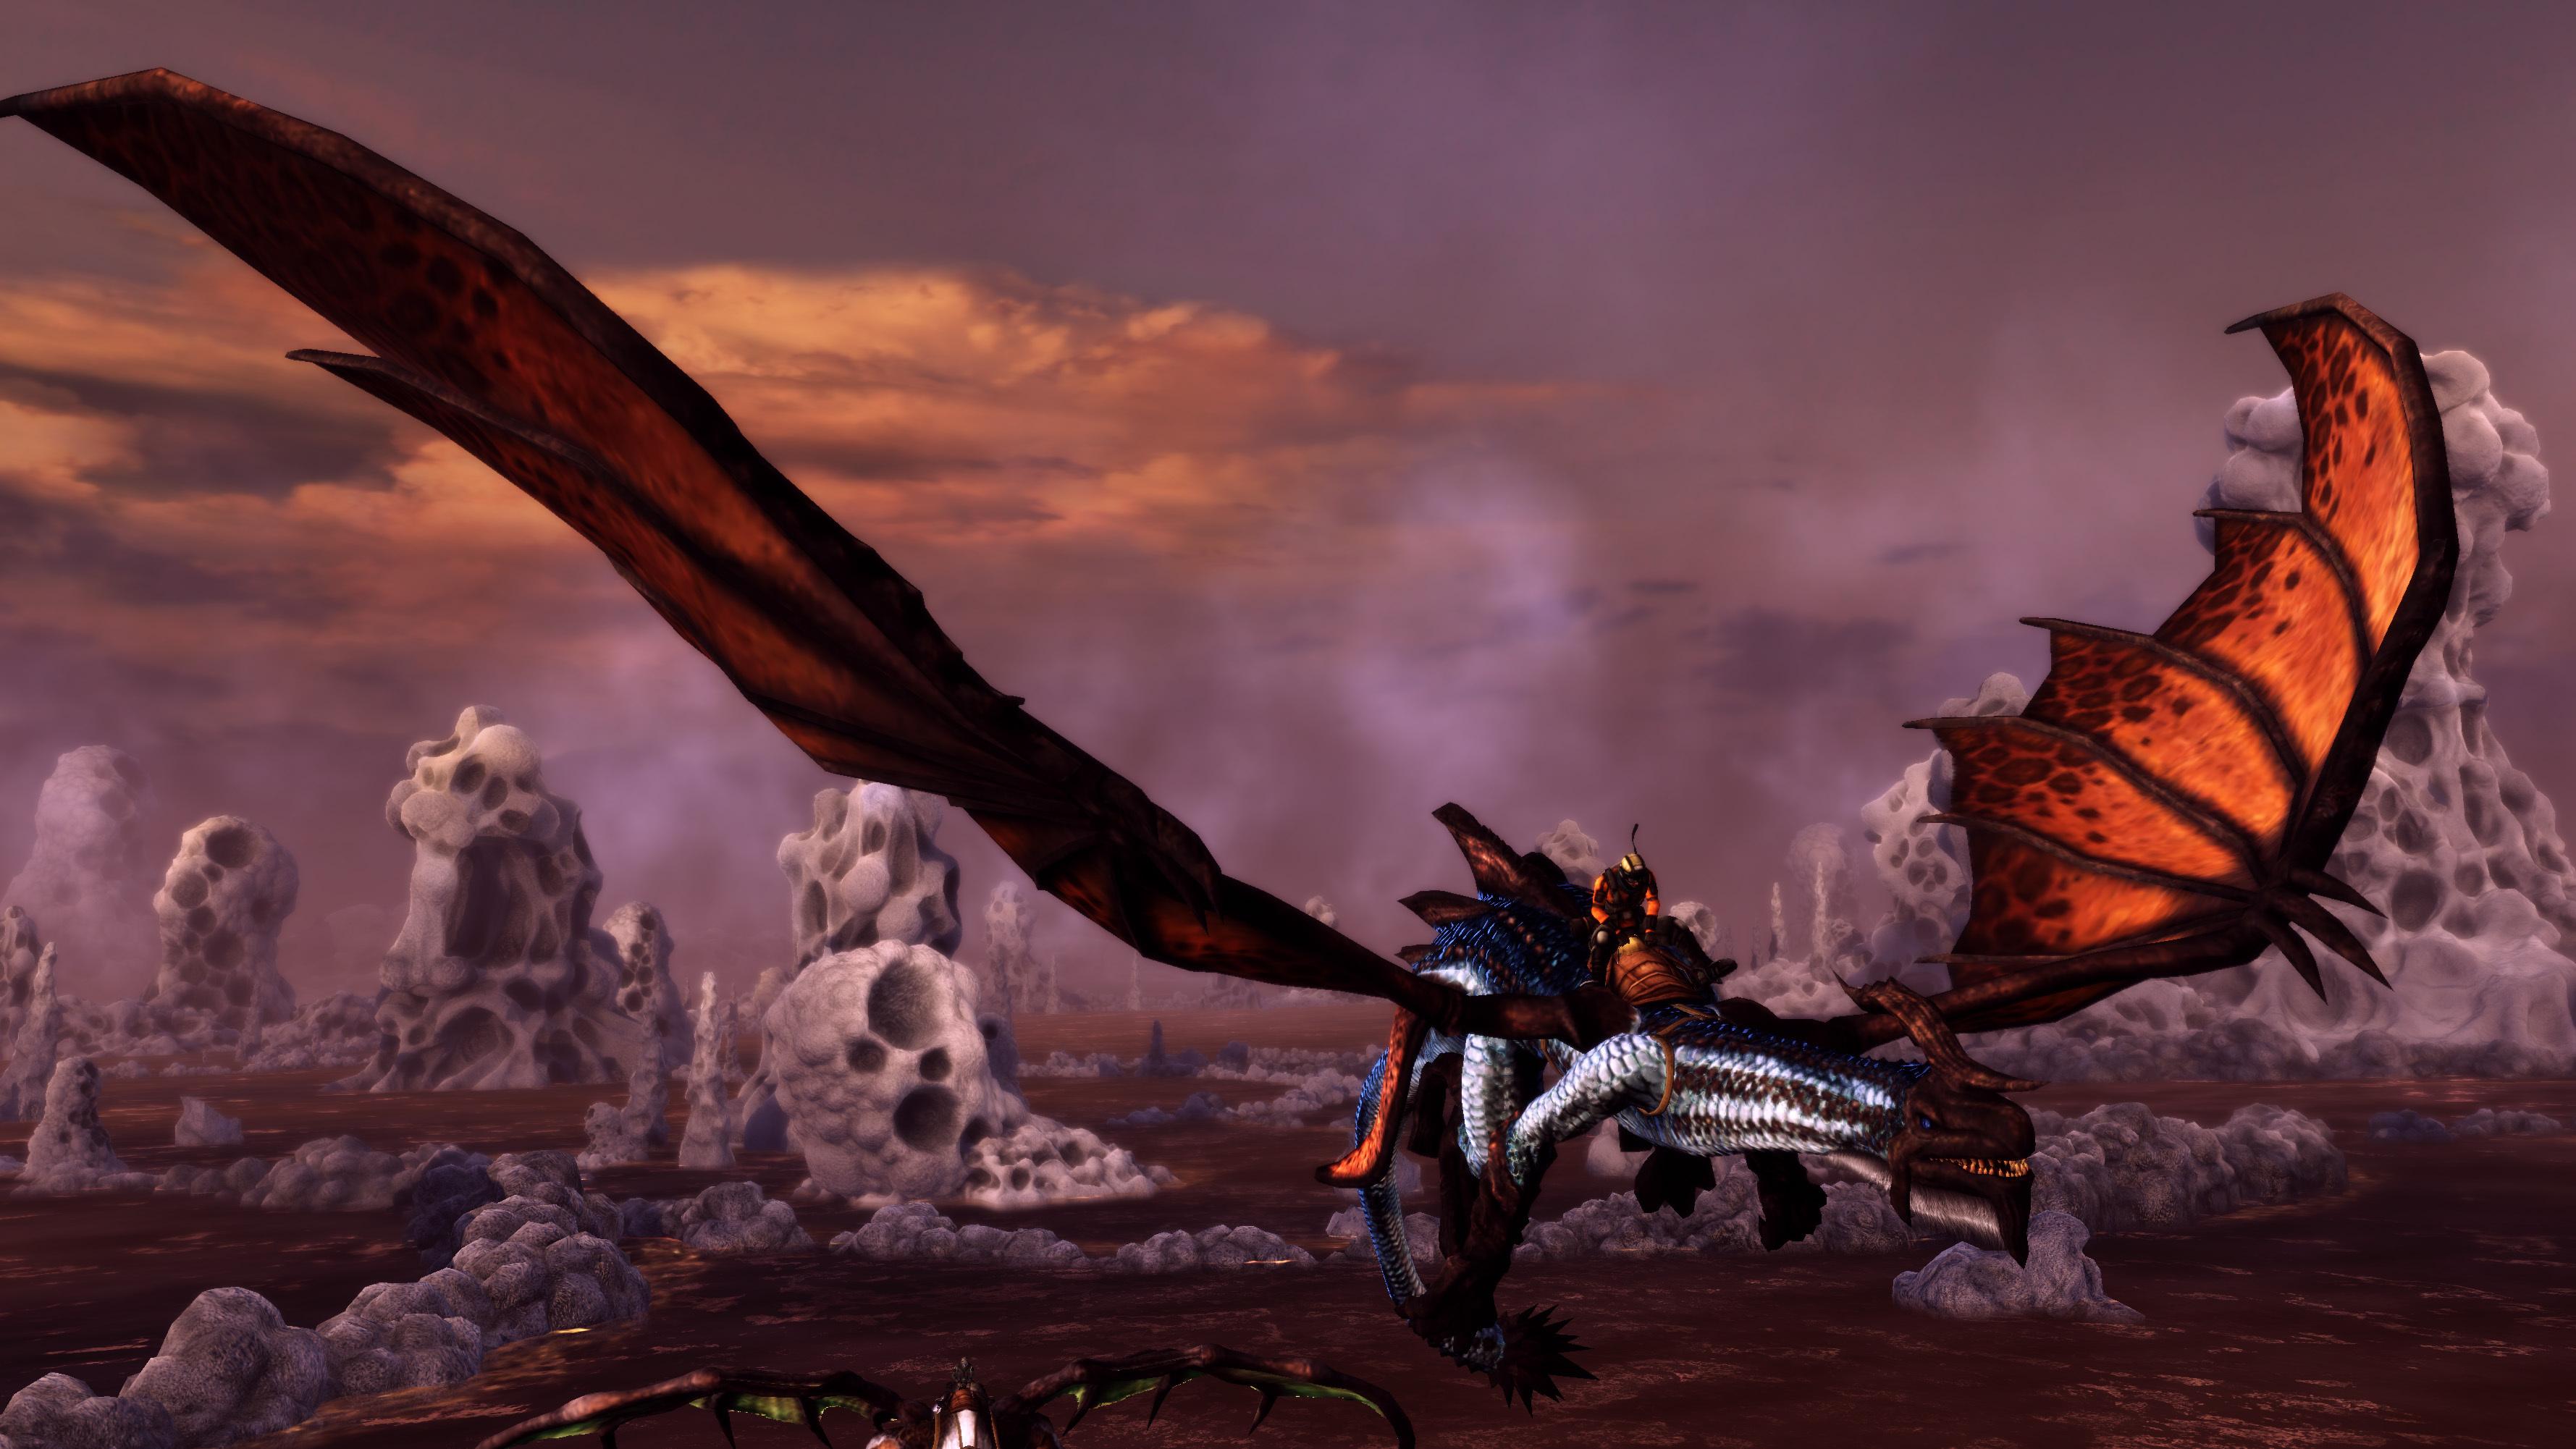 crimson dragon wallpaper - photo #12